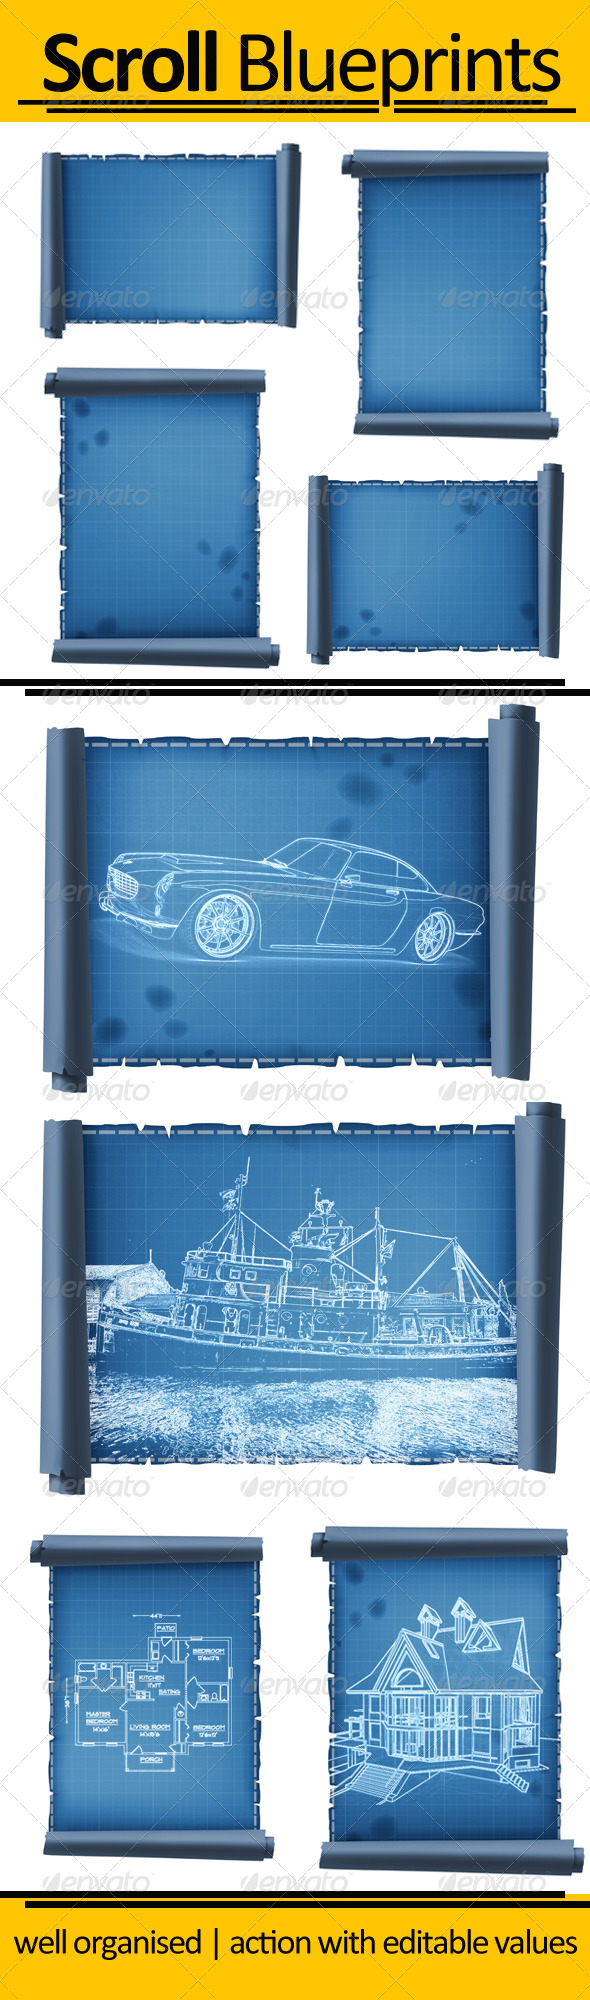 Scroll Blueprint - Photoshop Add-ons